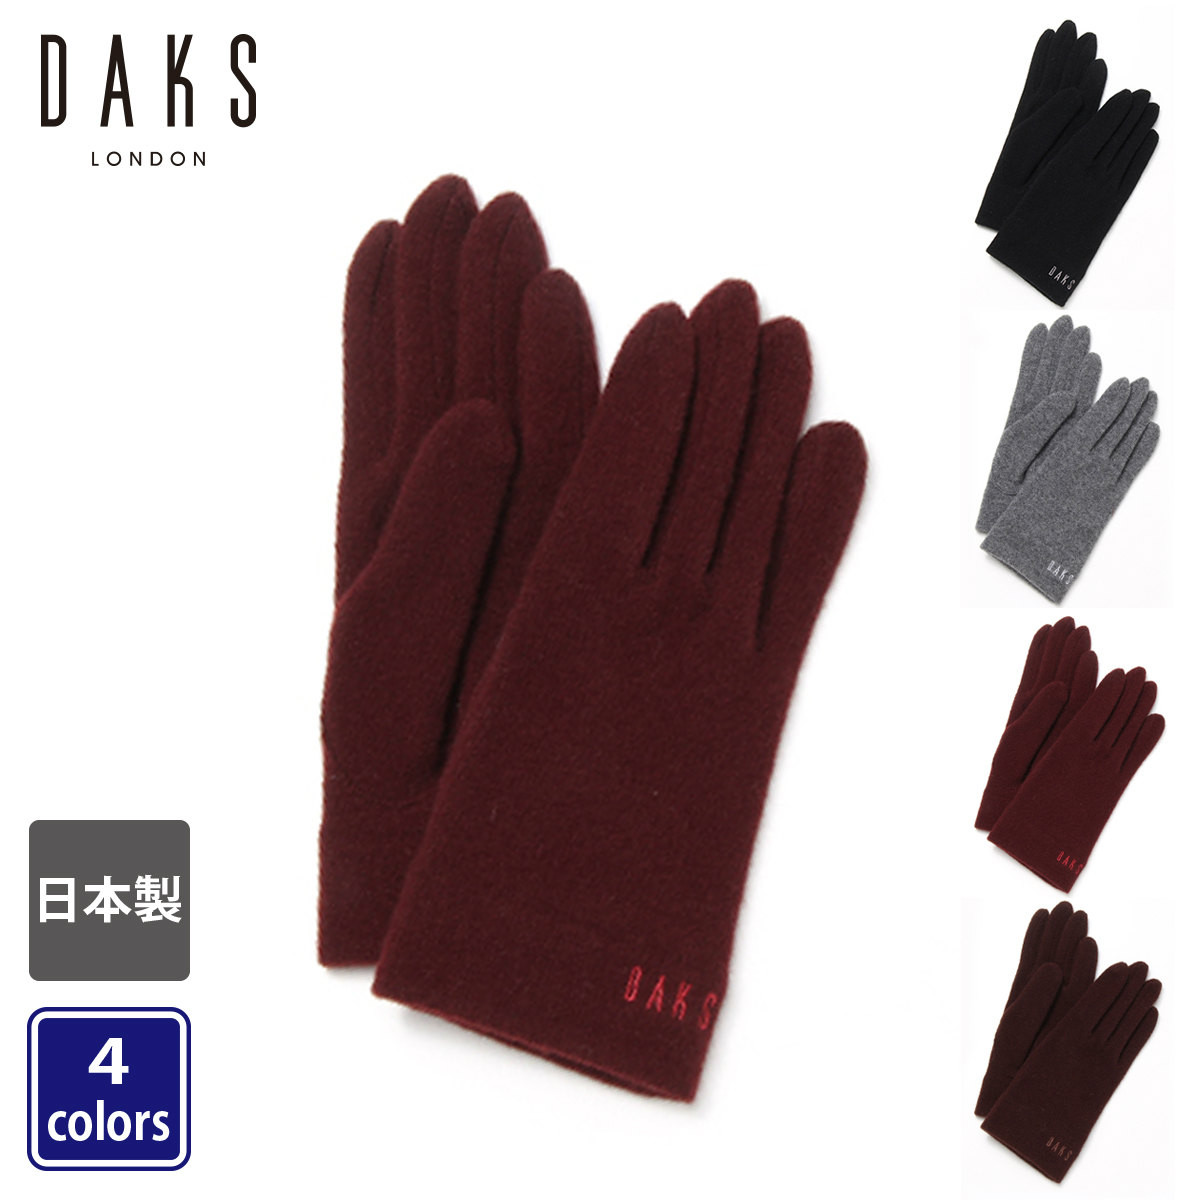 DAKS ロゴ刺繍入り シンプル ウール100% ジャージ レディース手袋 日本製 Mサイズ 全4色